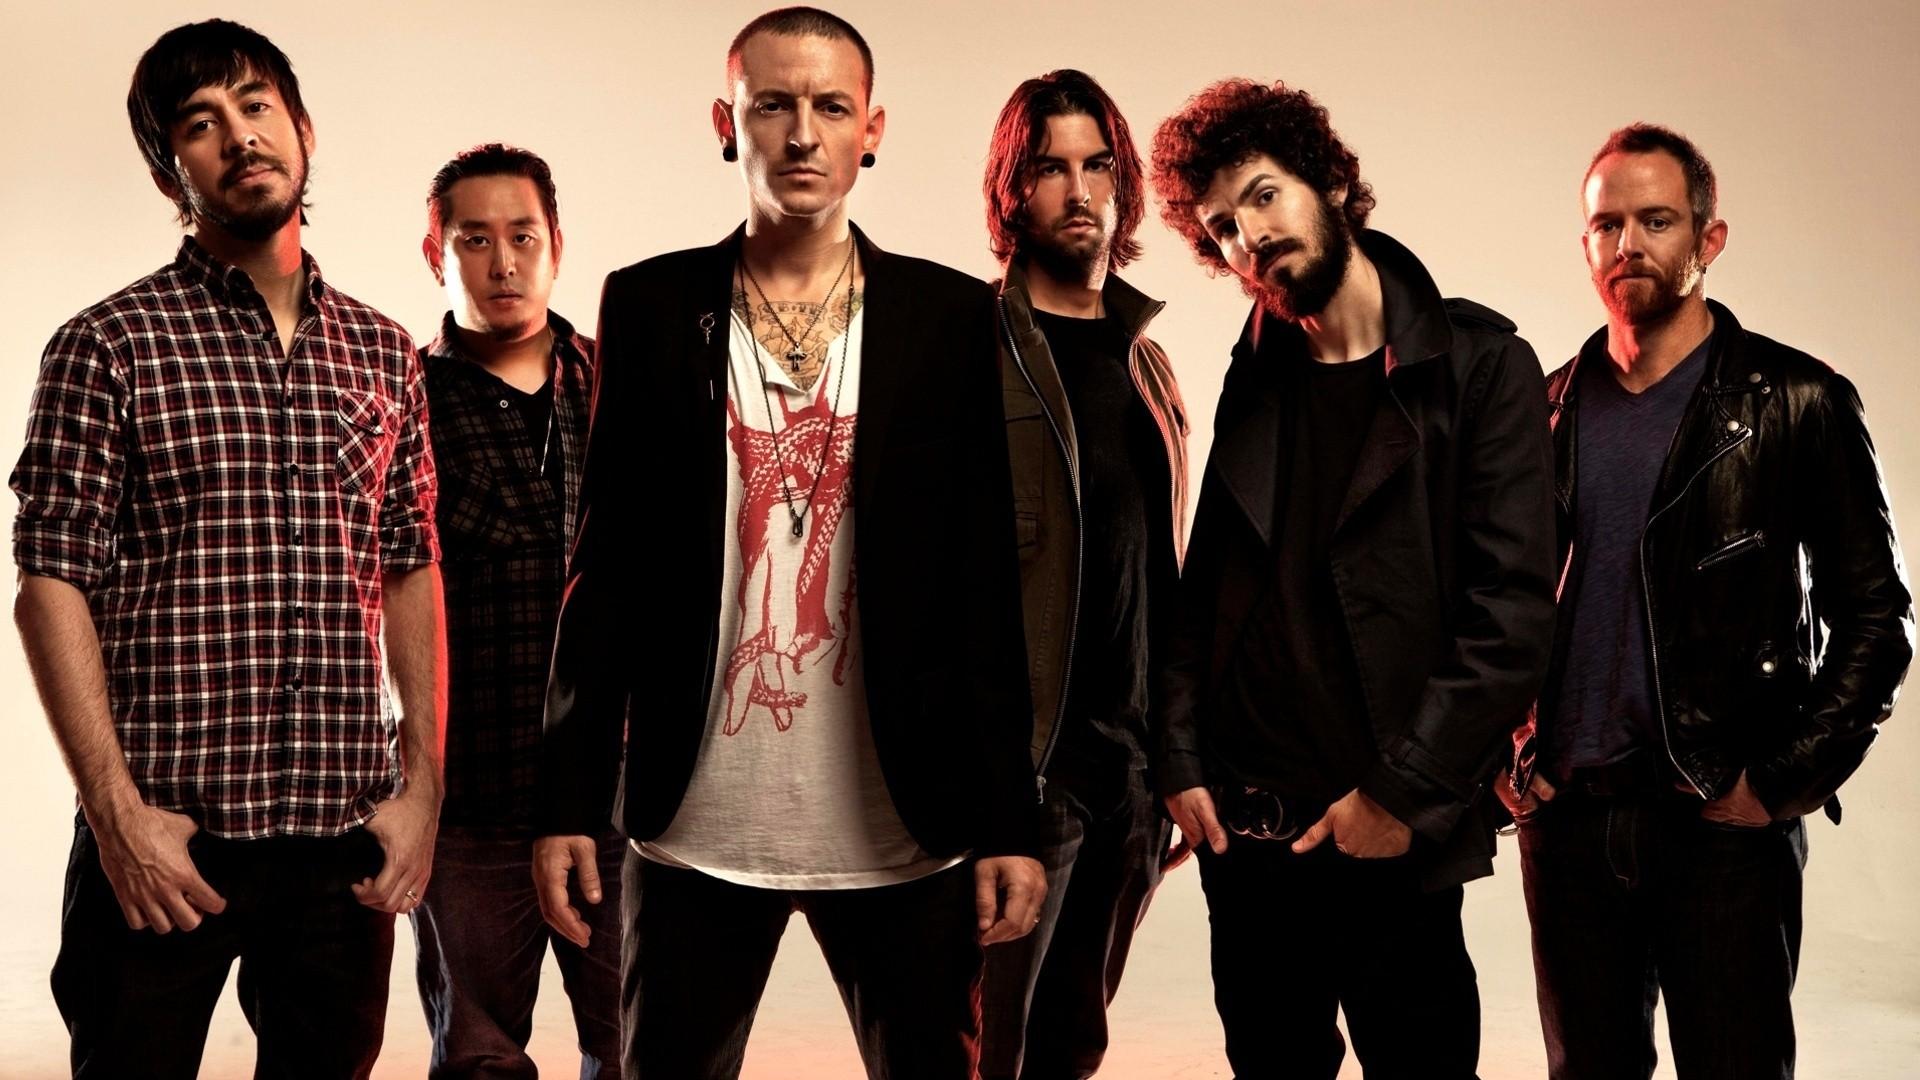 Linkin Park Wallpaper Free Download